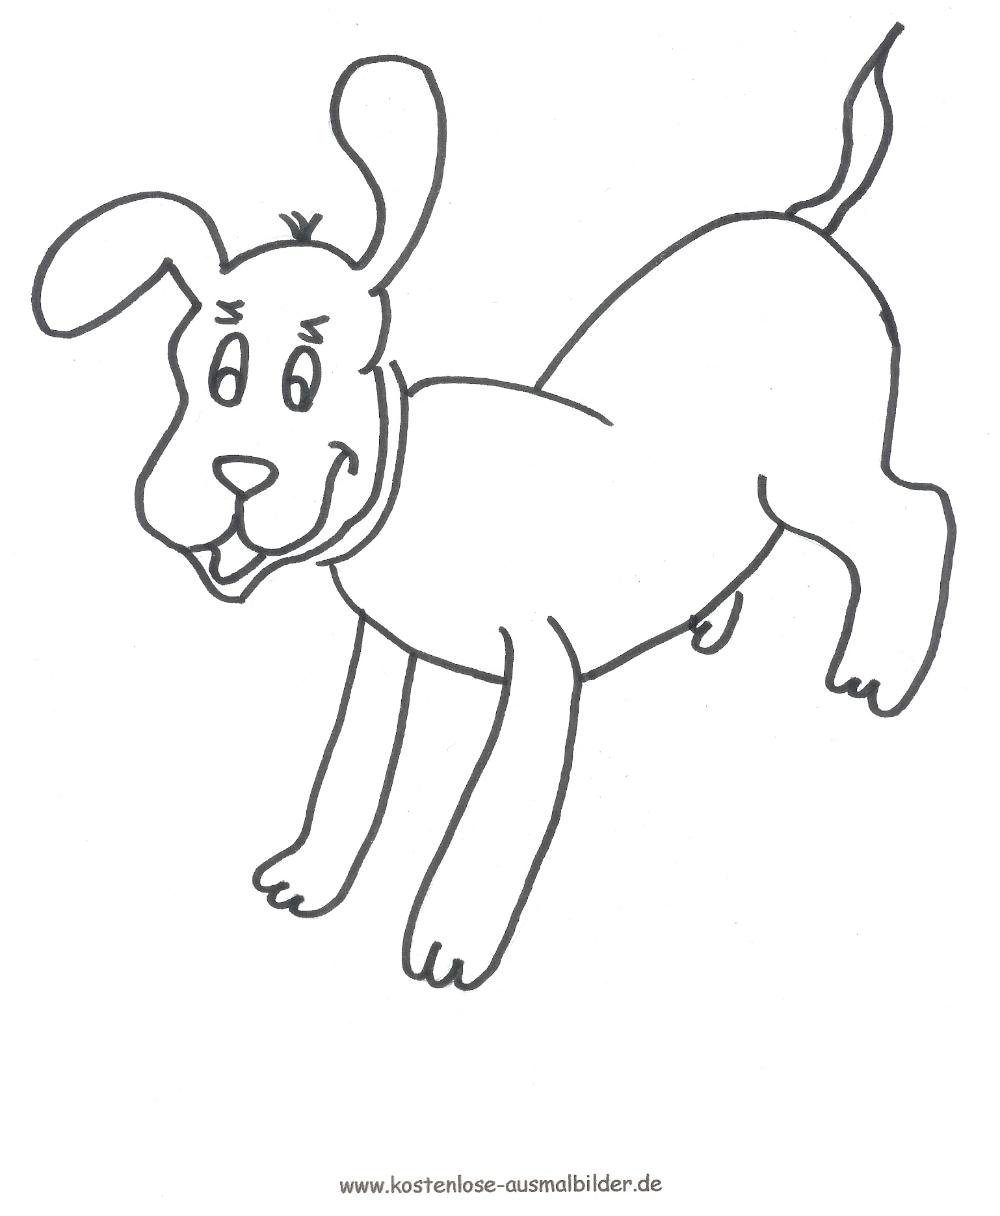 Ausmalbild Welpe  Ausmalbilder hunde, Welpen, Ausmalen